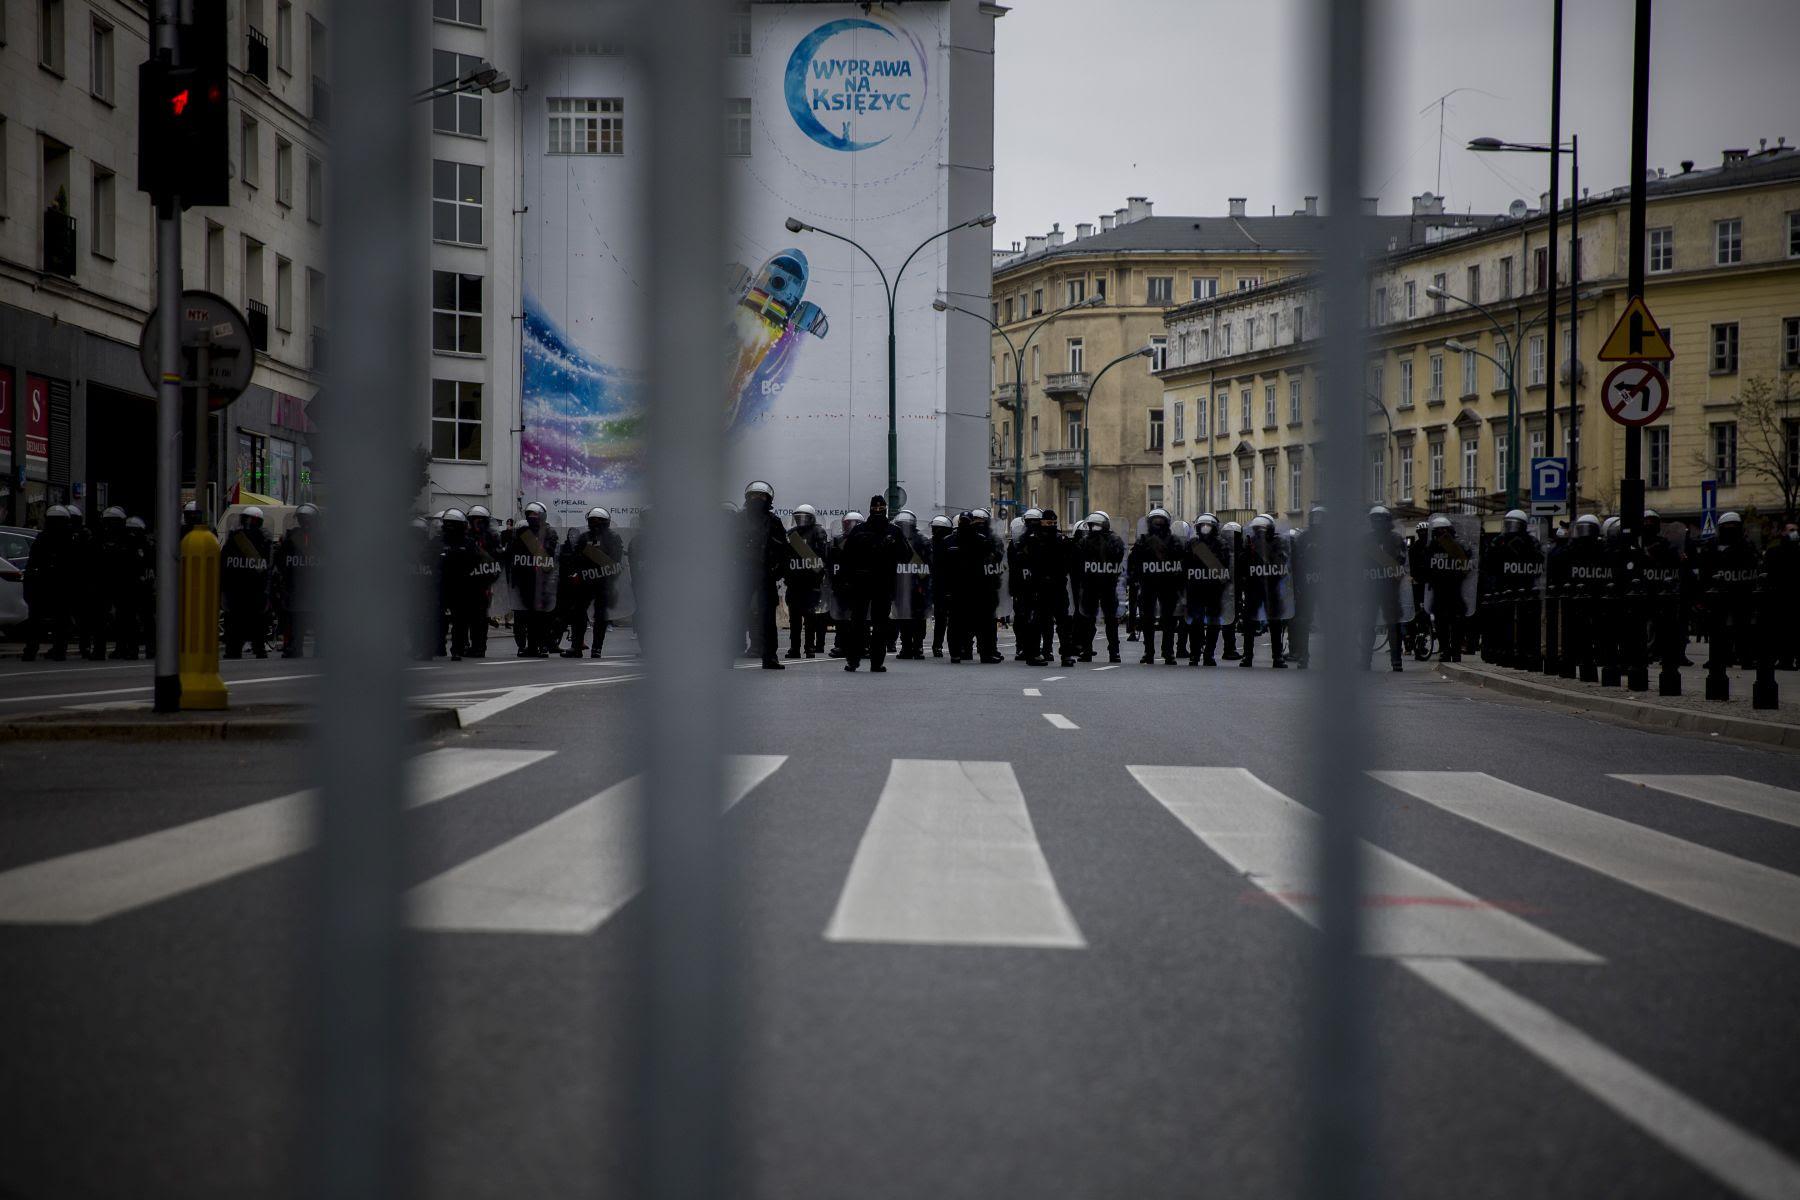 Marsz Niepodległości 2020: https://marszniepodleglosci.pl/wp-content/uploads/2020/11/20201111-Marsz-Niepodleglosci-fot.-K.-Olszewska-022.jpg